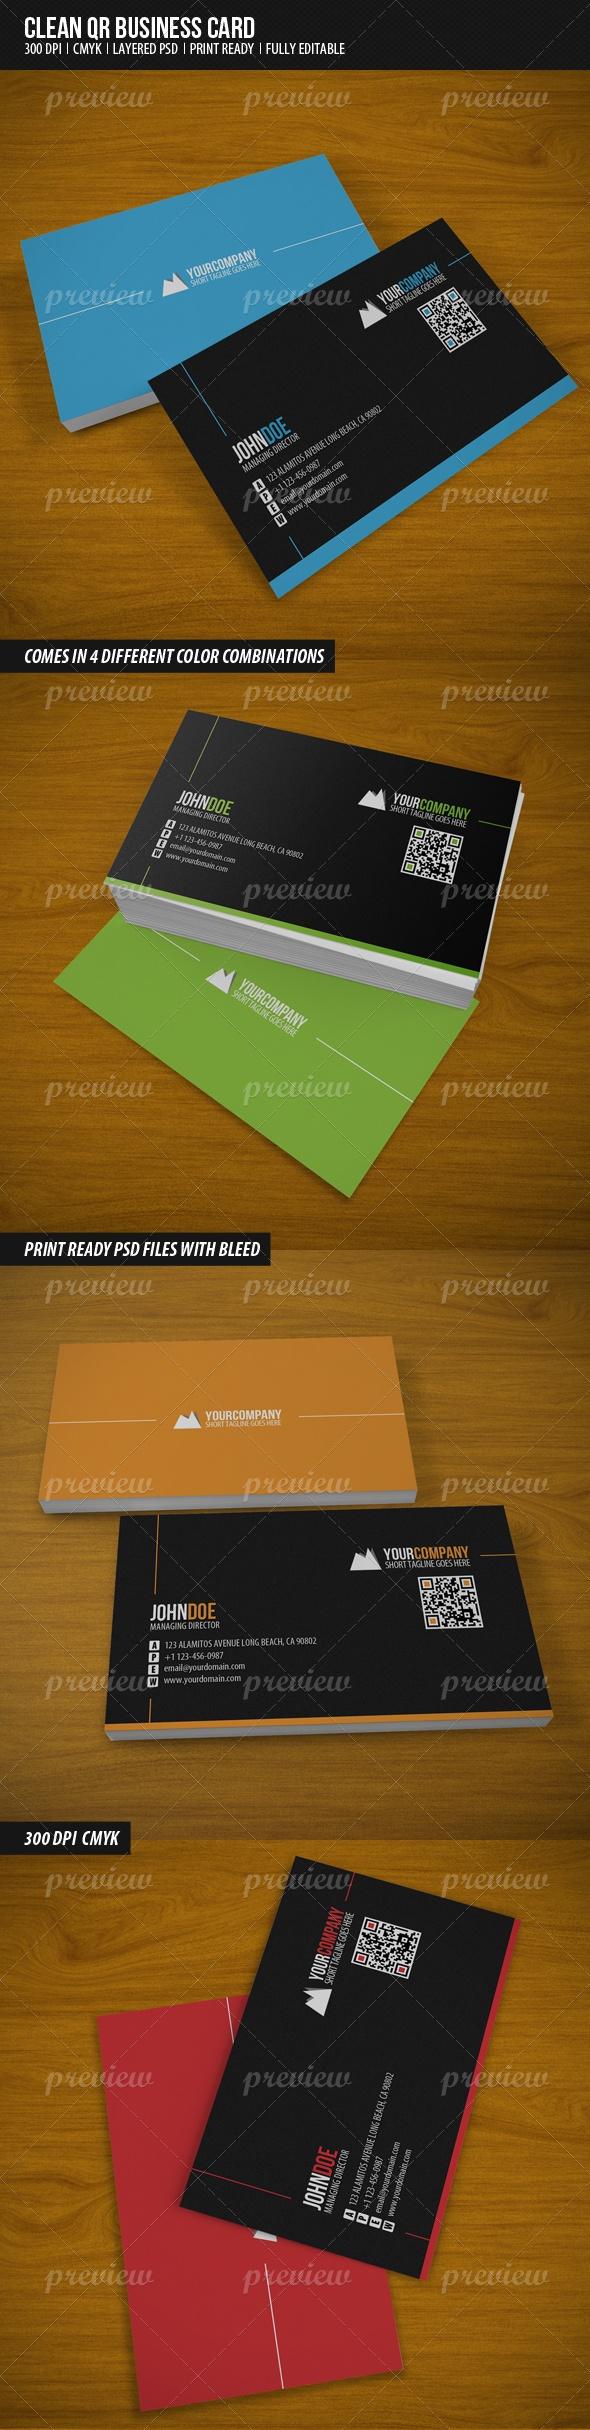 82 best business card images on Pinterest | Business cards, Carte de ...